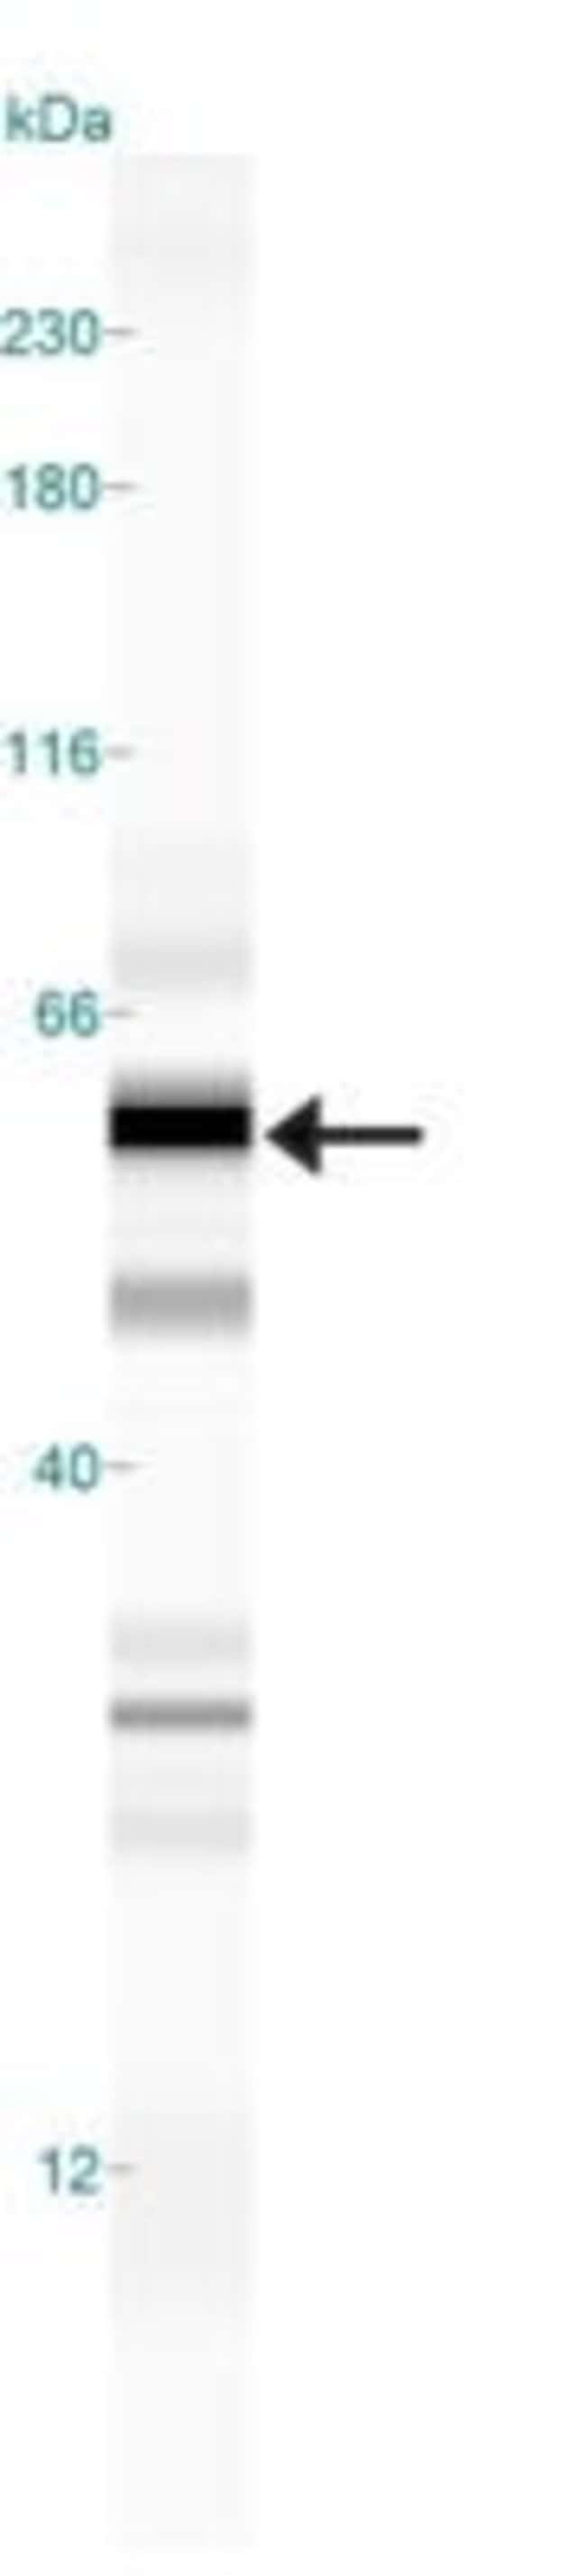 anti-ATP13A2, Polyclonal, Novus Biologicals:Antibodies:Primary Antibodies